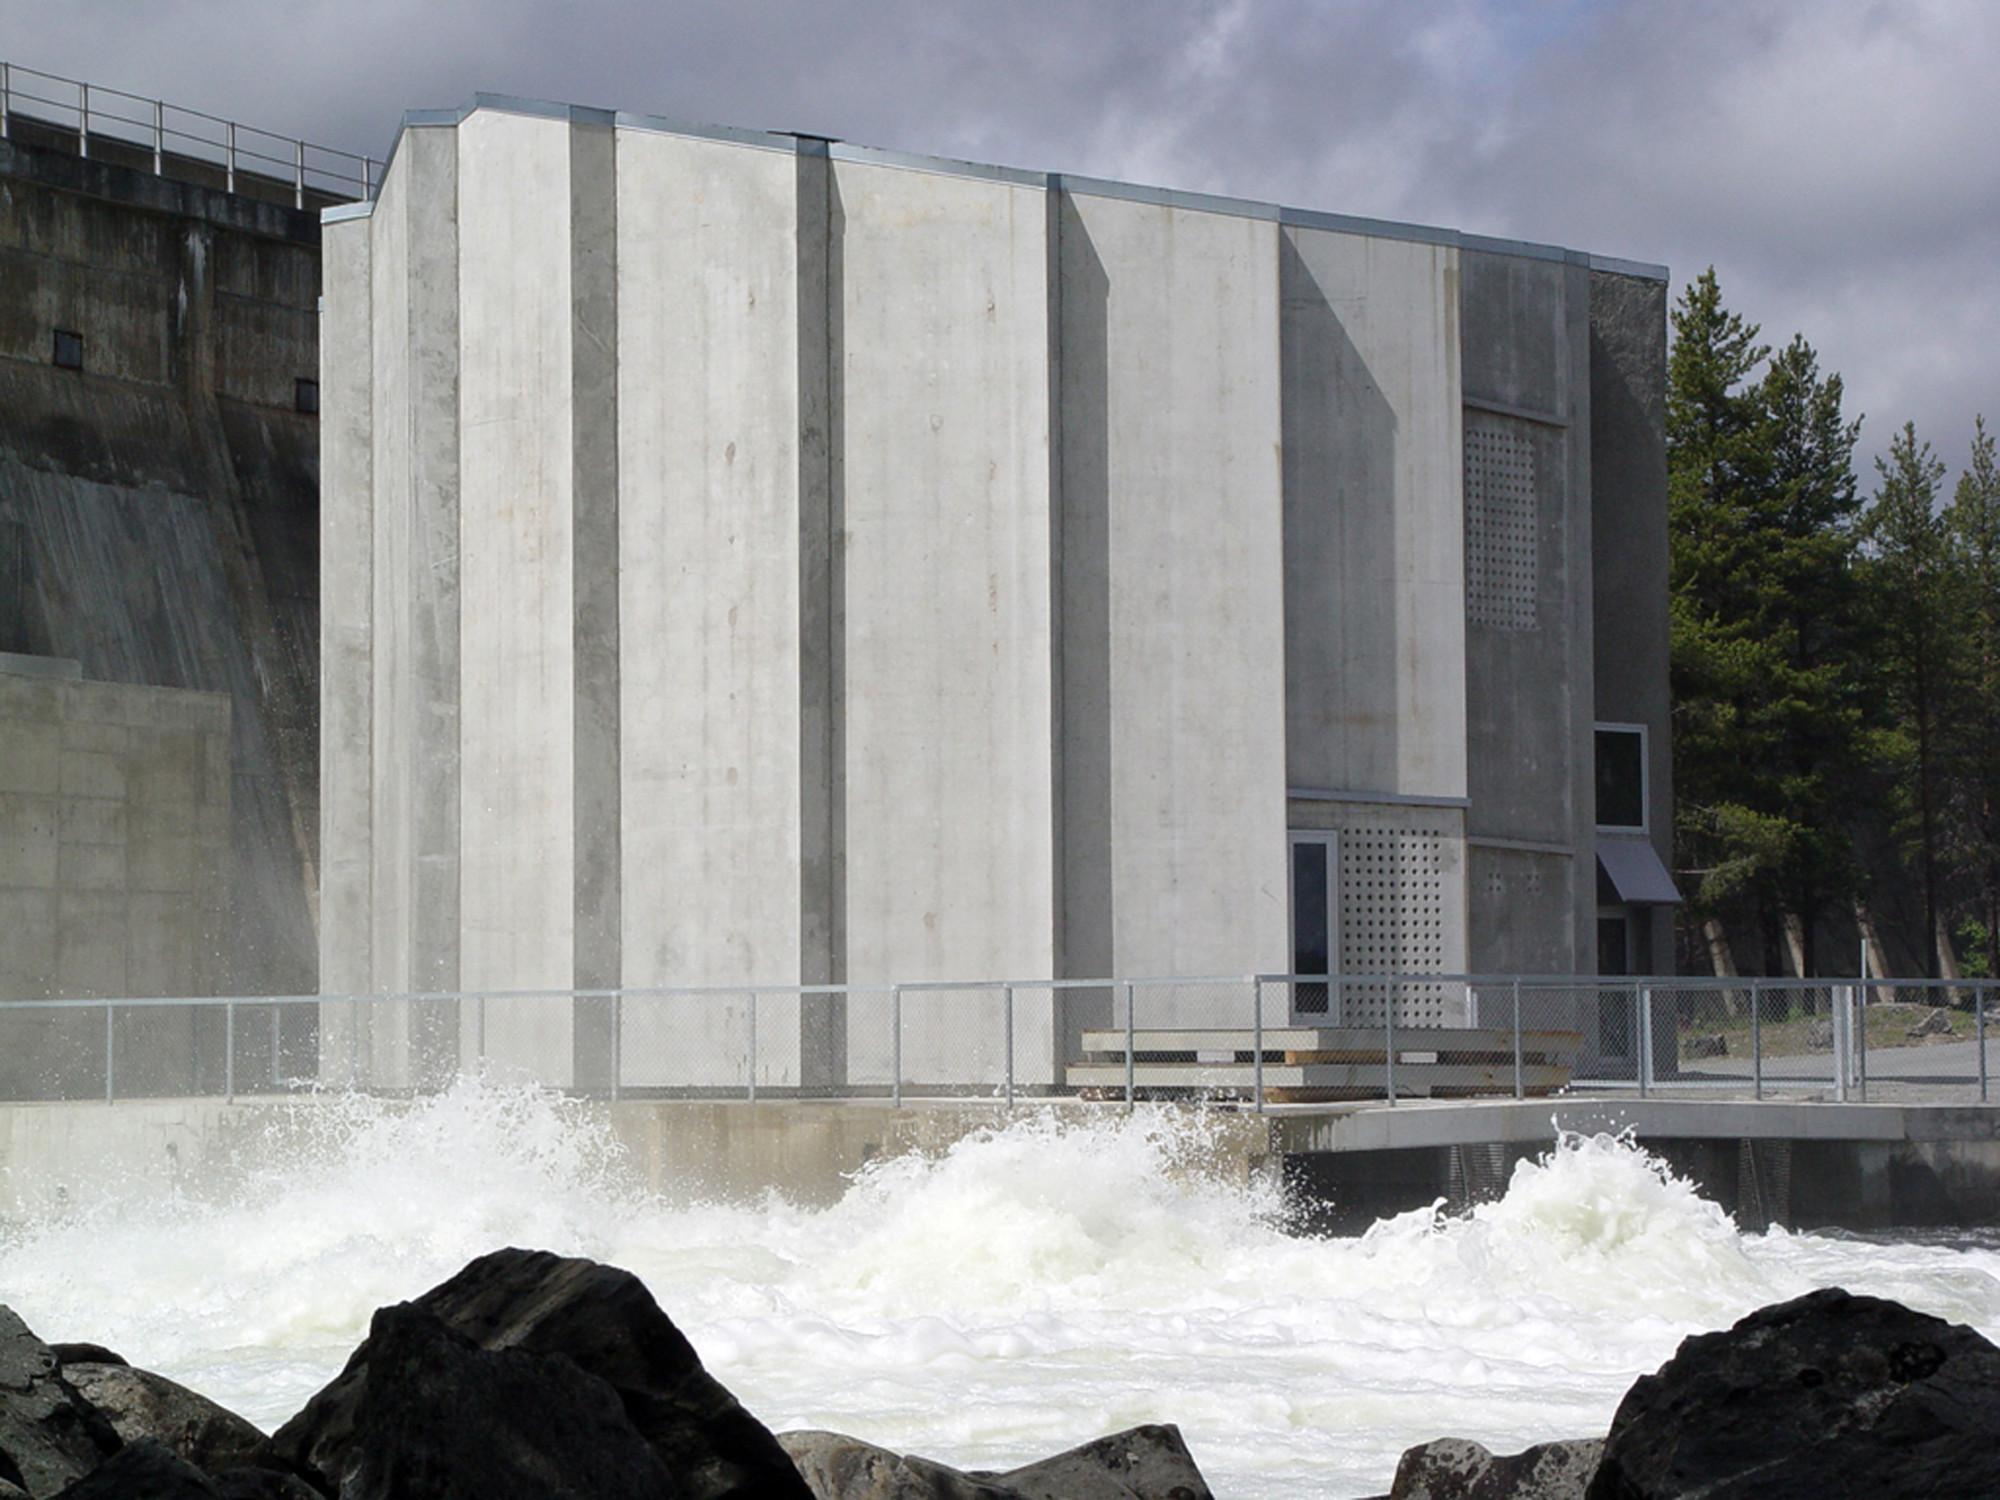 Pålsbu Hydro Power Station / Manthey Kula Architects, Courtesy of Manthey Kula Architects